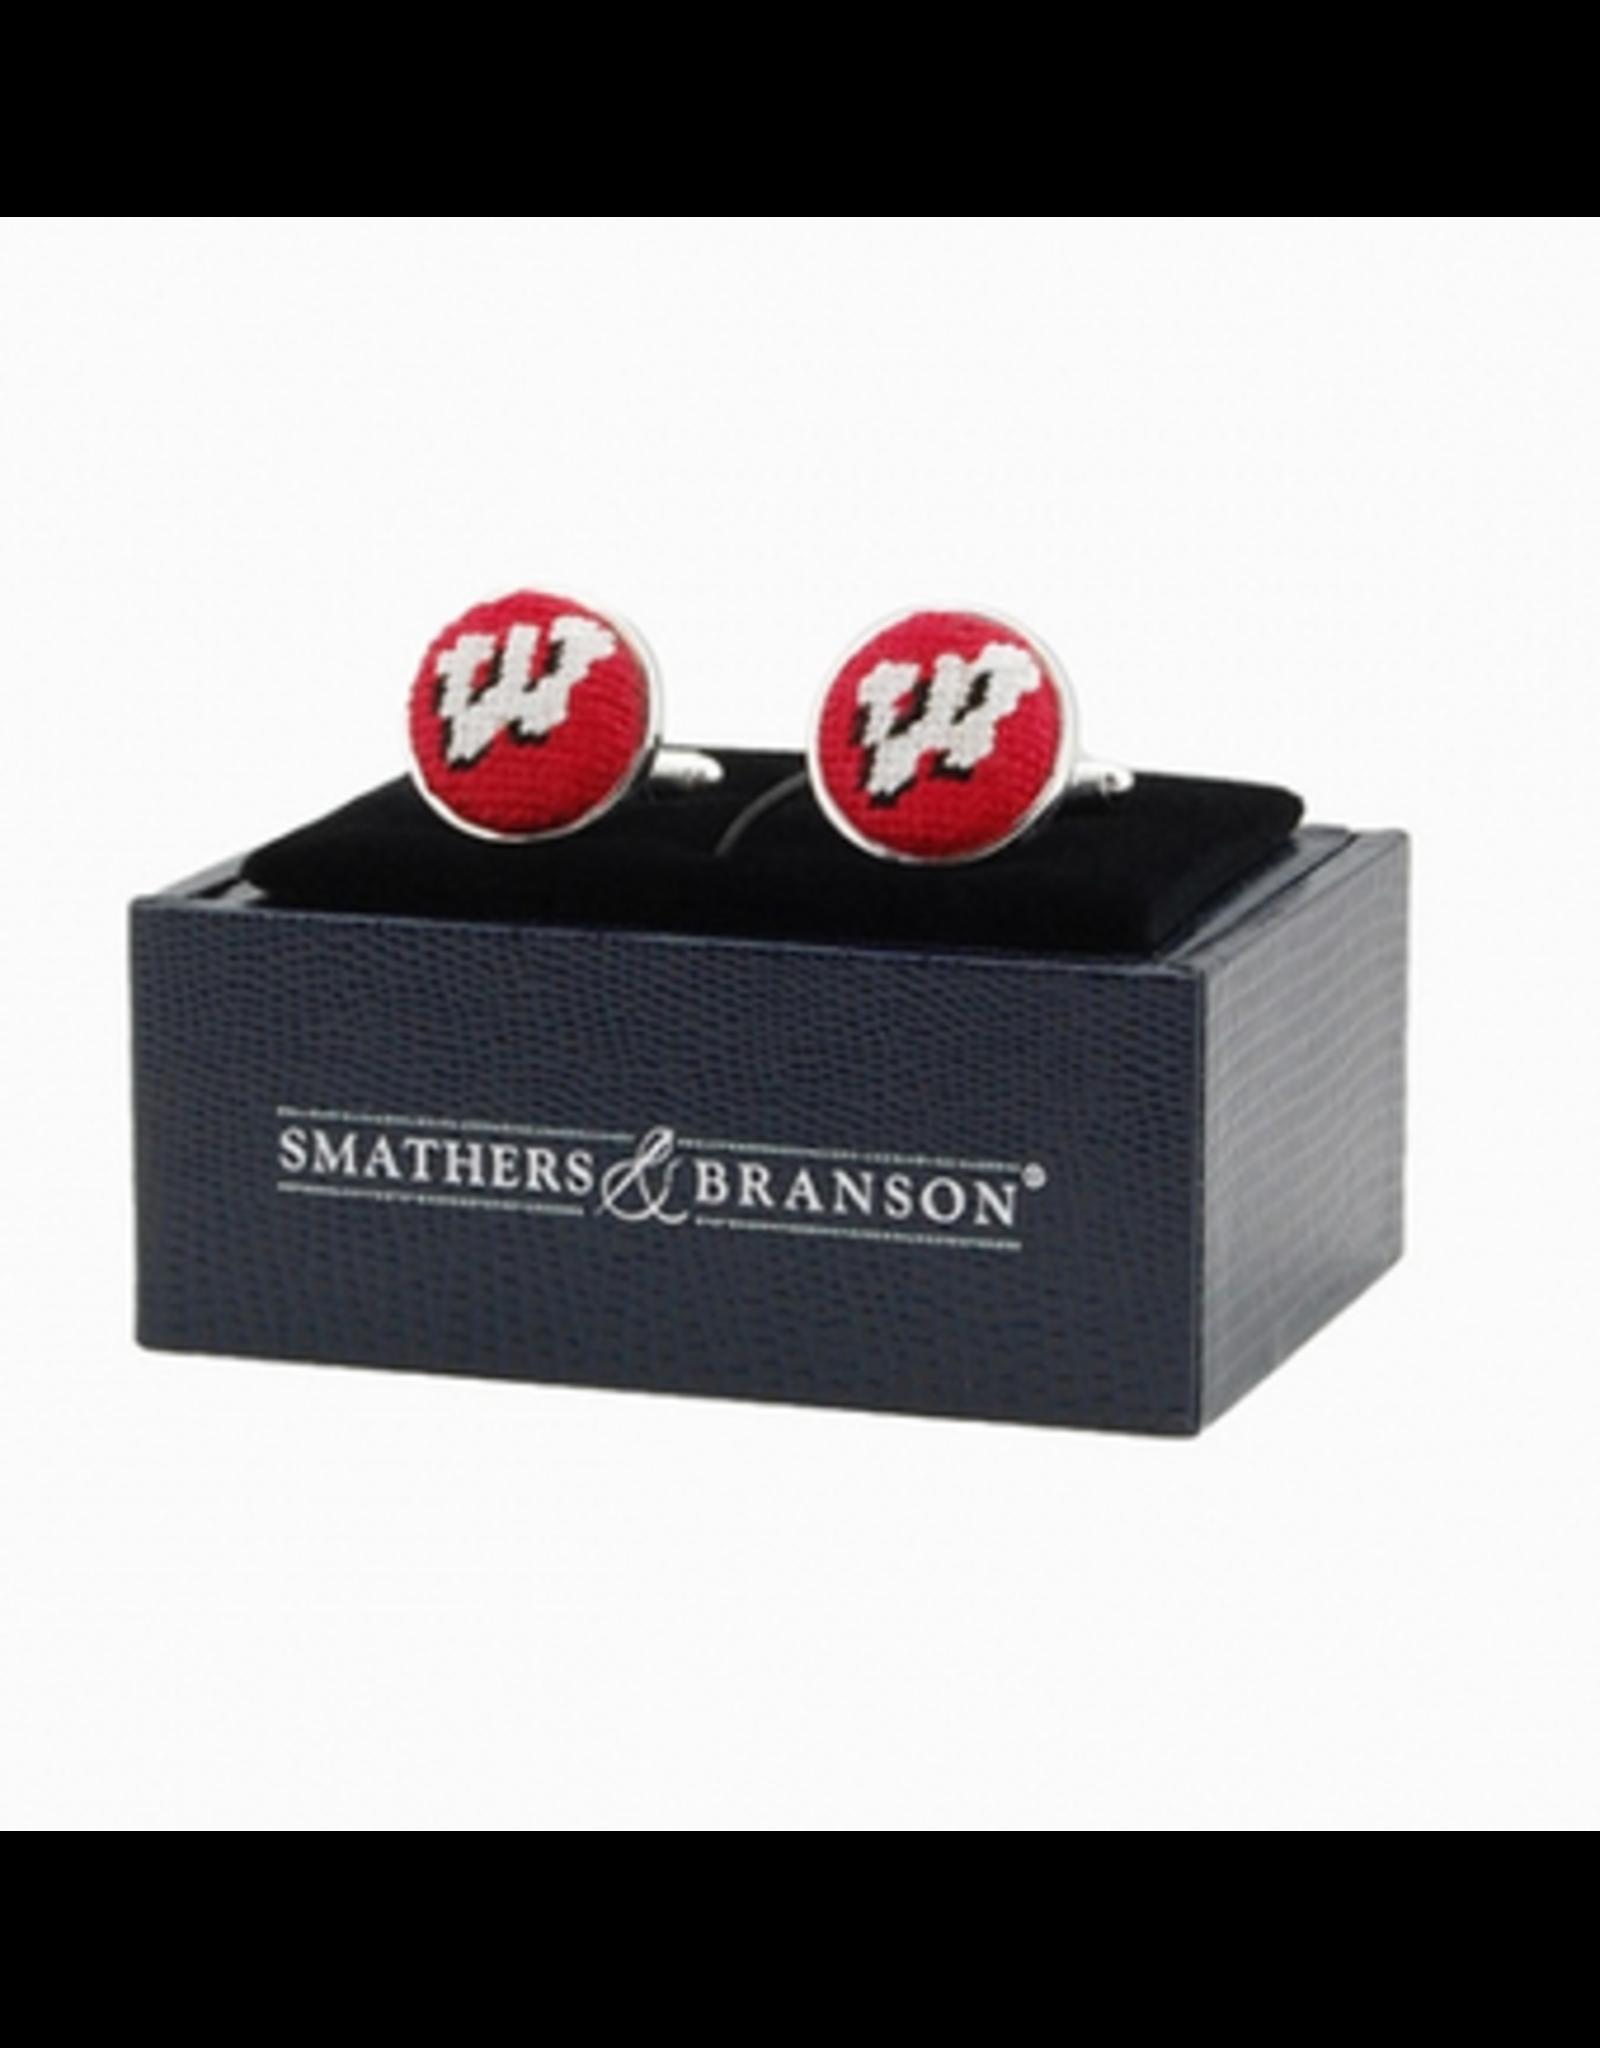 Smathers & Branson Wisconsin Cuff Links